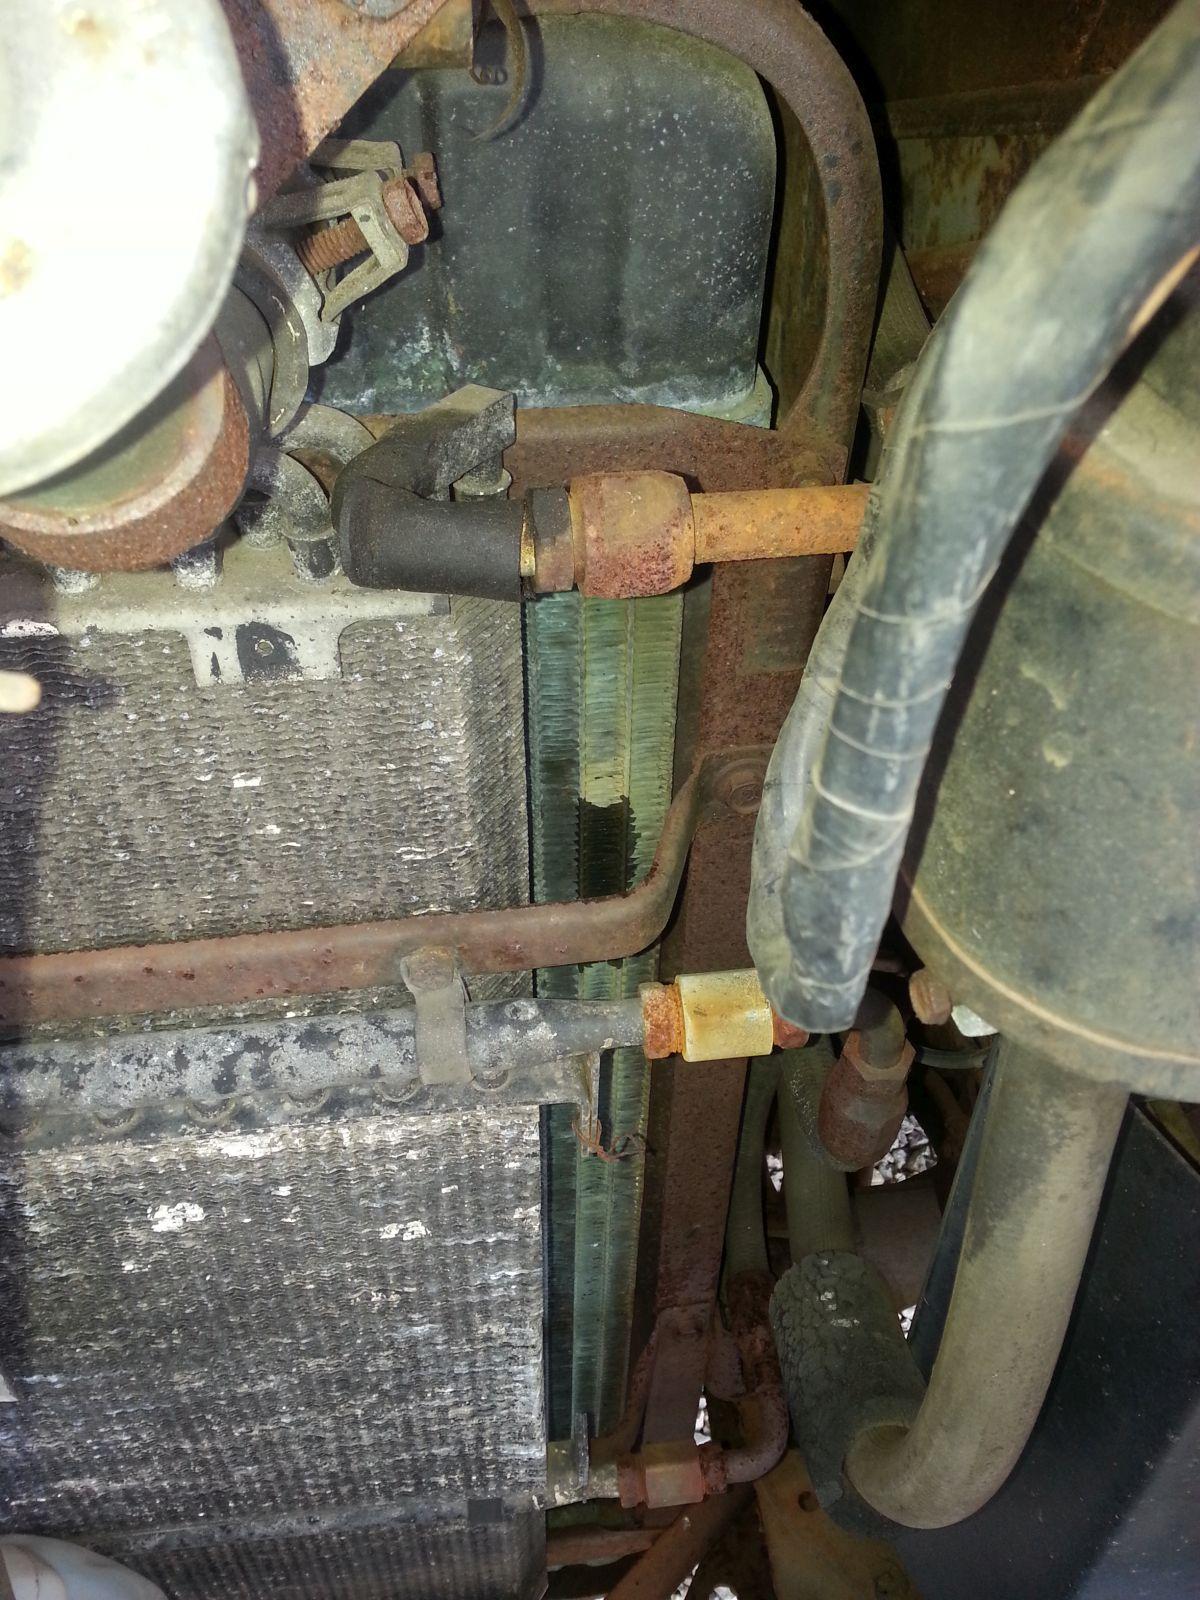 Click image for larger version  Name:peanut-radiator.jpg Views:72 Size:347.4 KB ID:259890